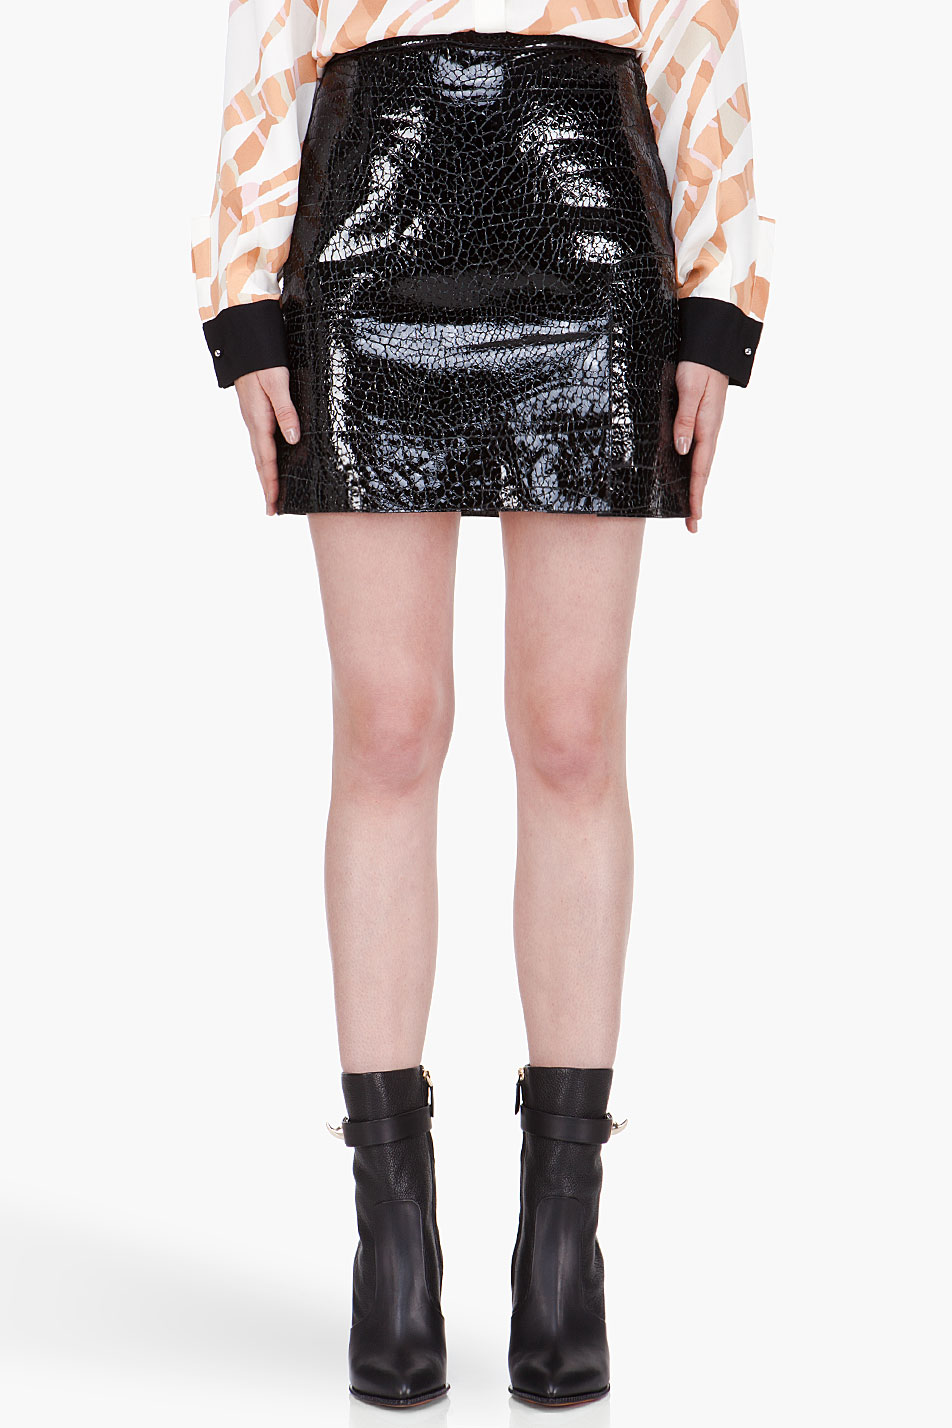 3 1 phillip lim black lizardskin patent leather skirt in